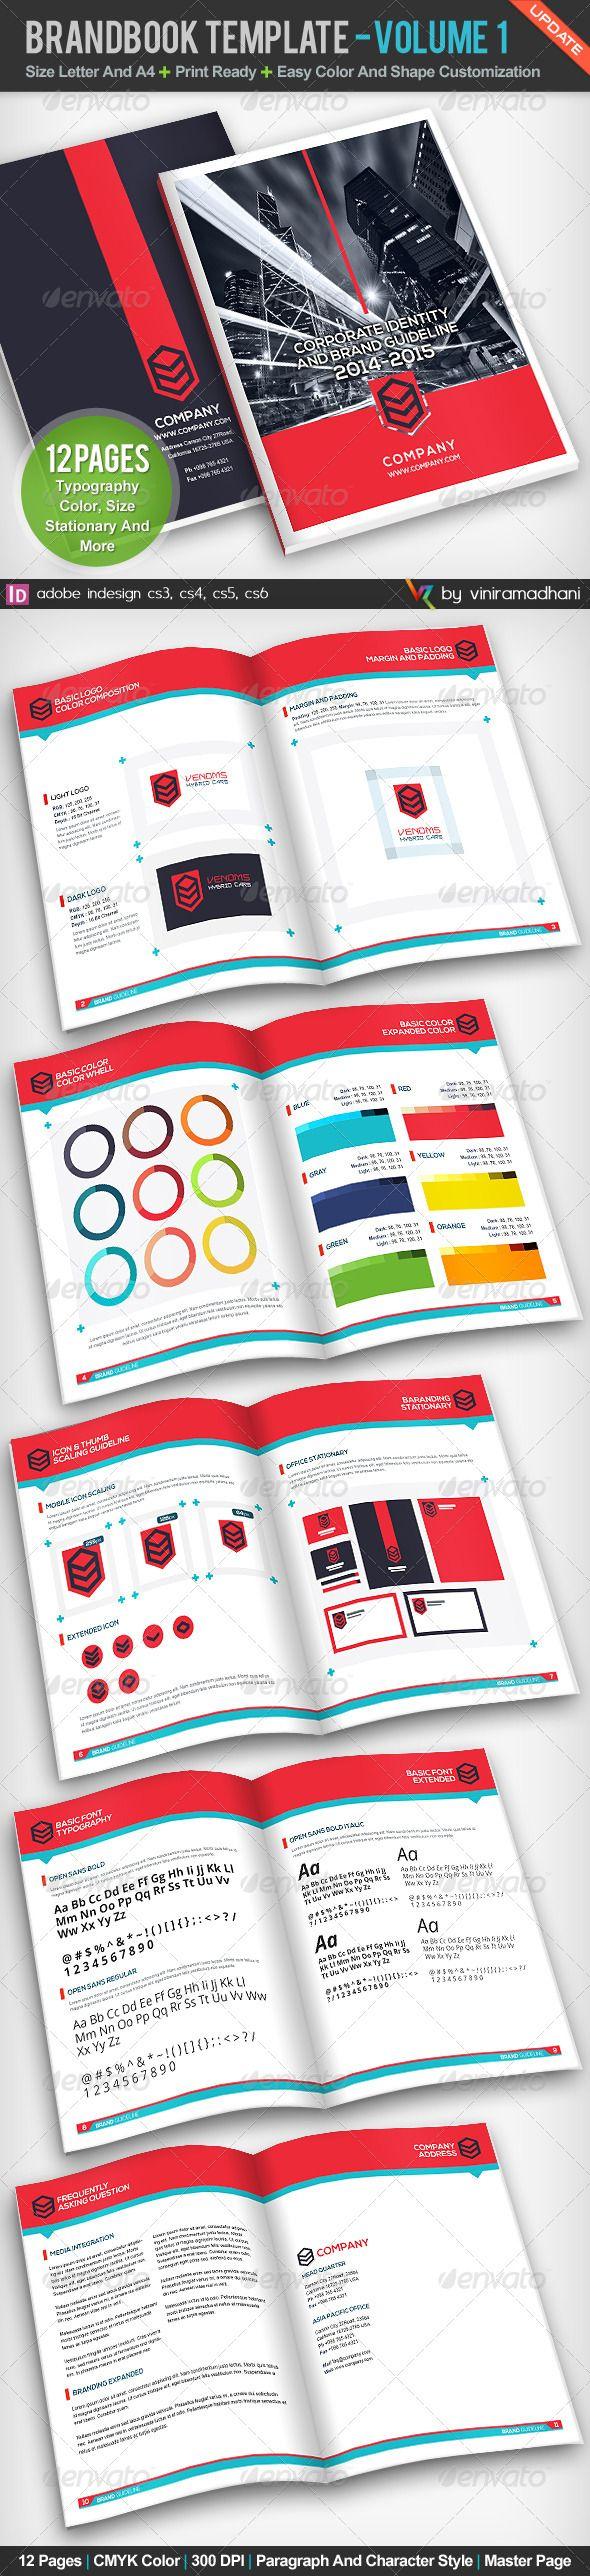 BrandBook Template | Volume 1 #GraphicRiver BrandBook Template ...